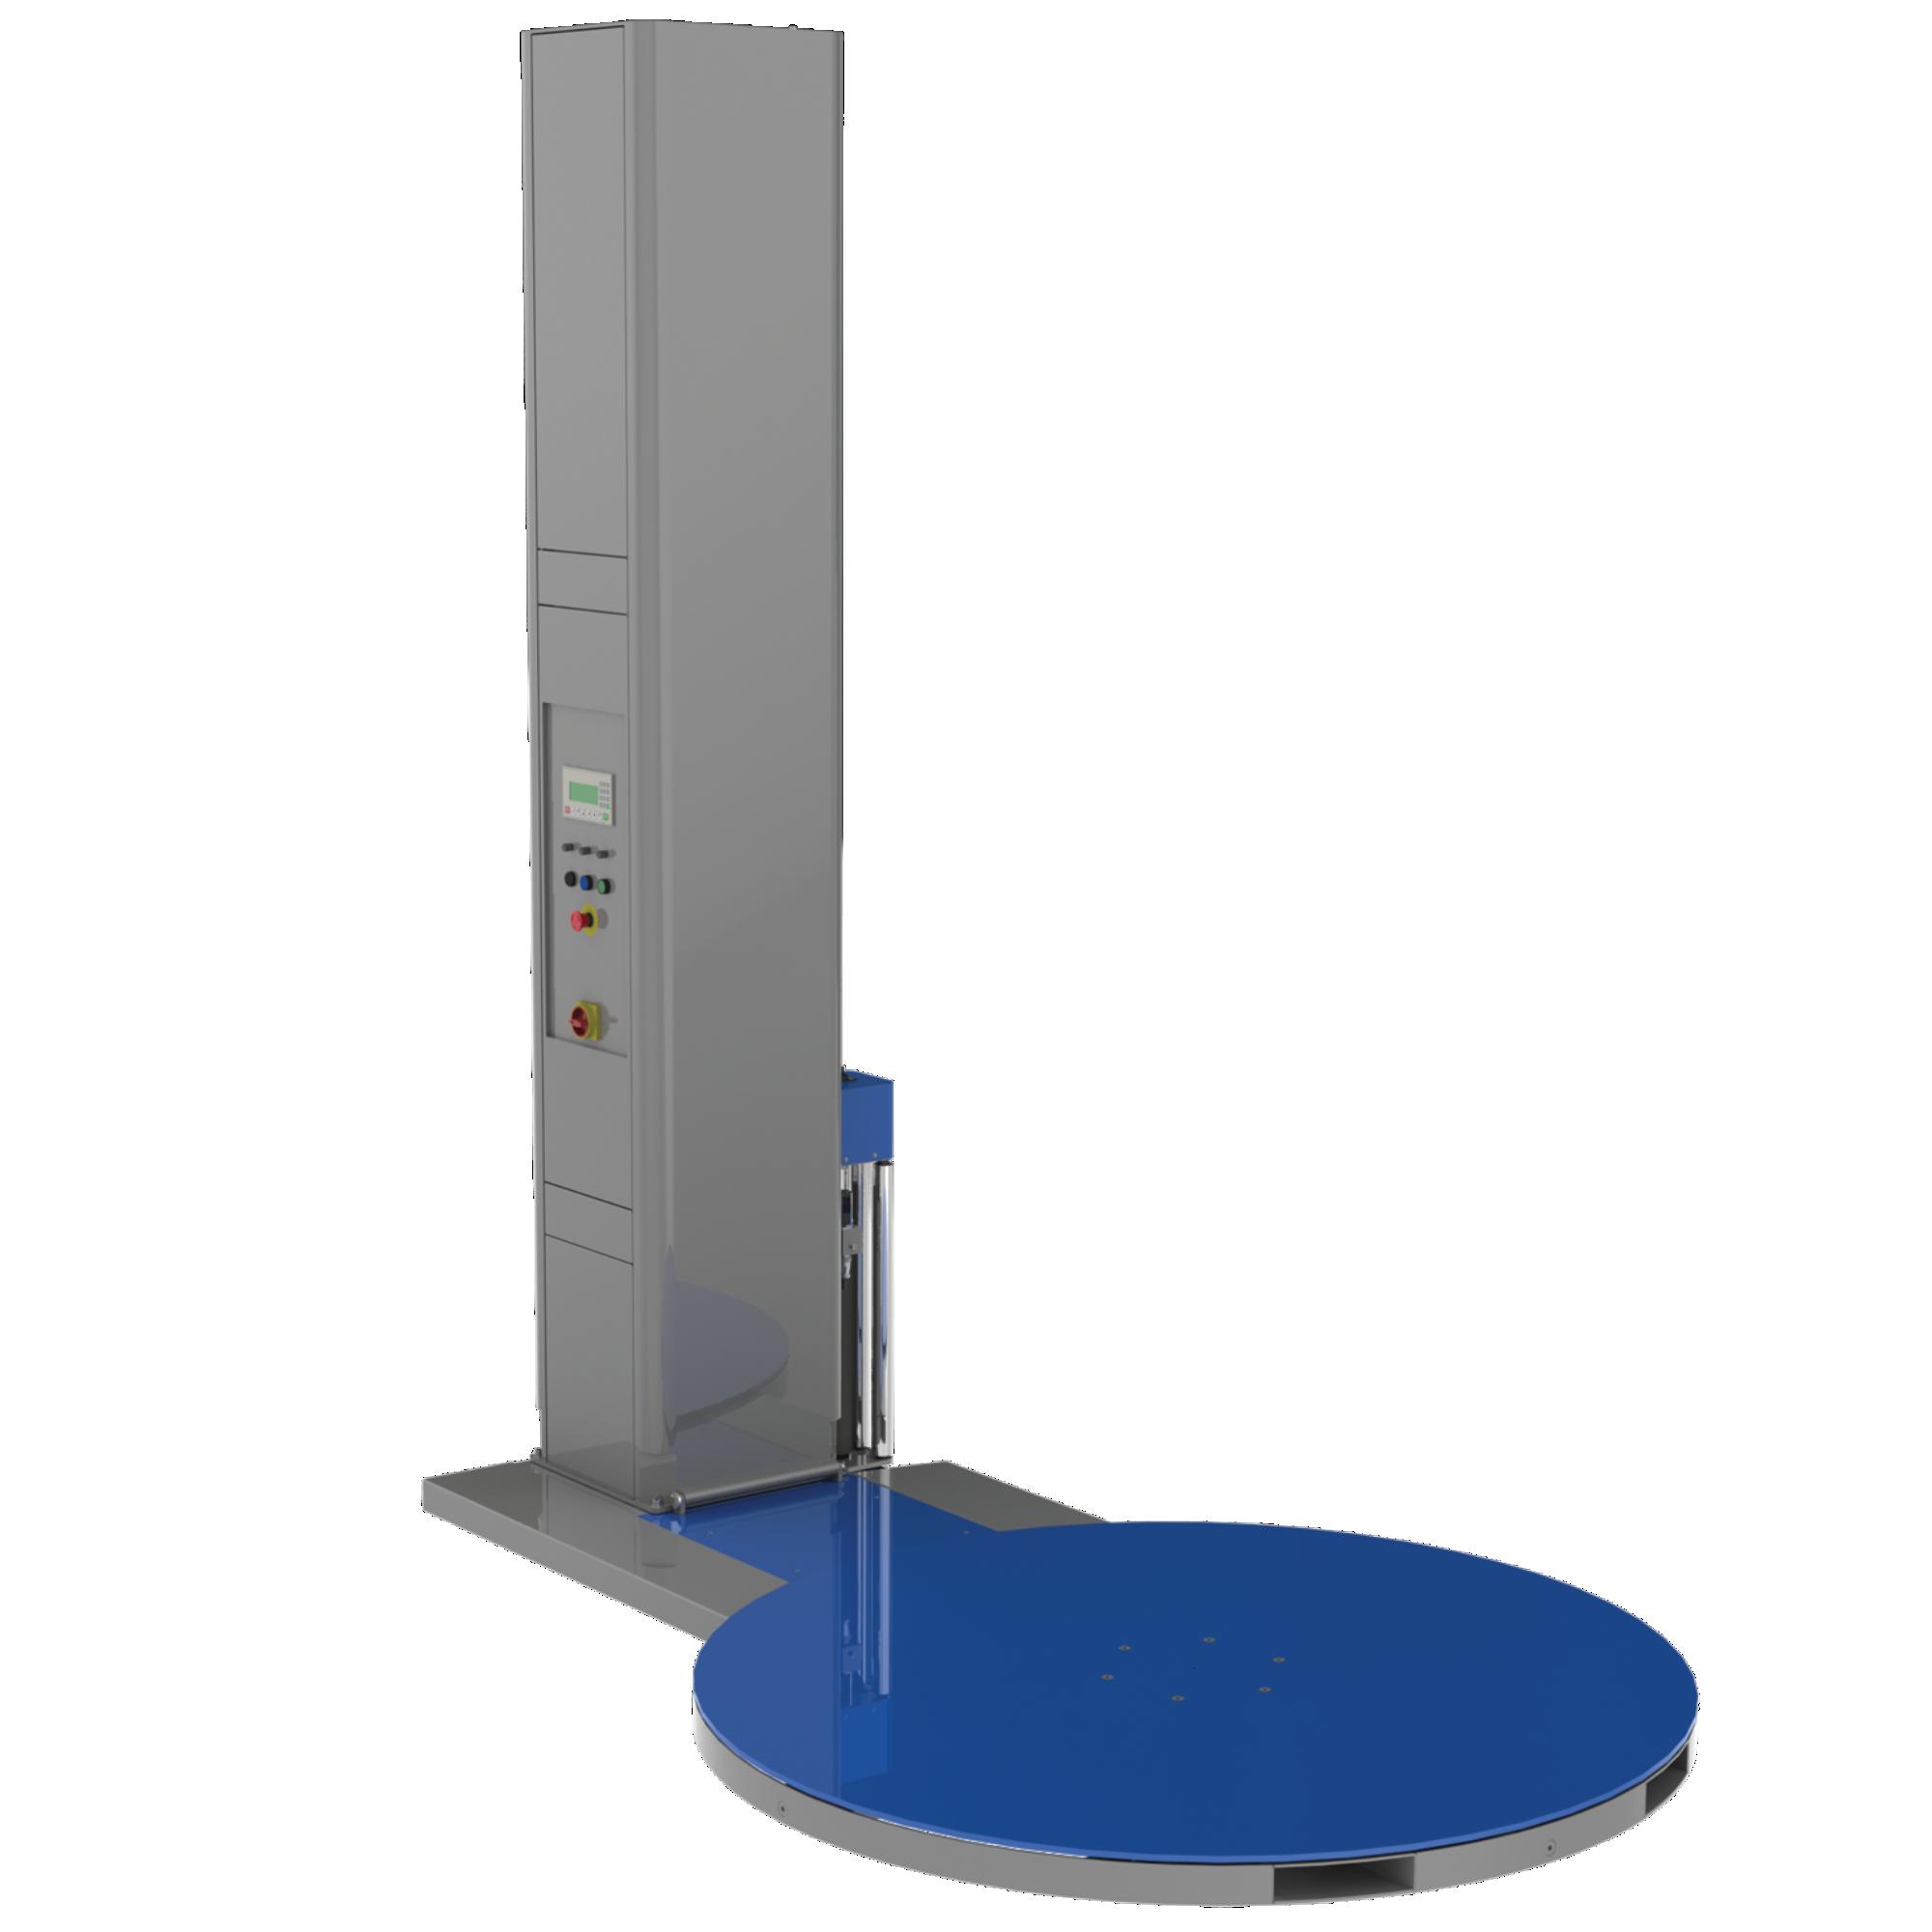 FG-2000AEpentrupaleți usori,cu tensionare electromagnetica a foliei